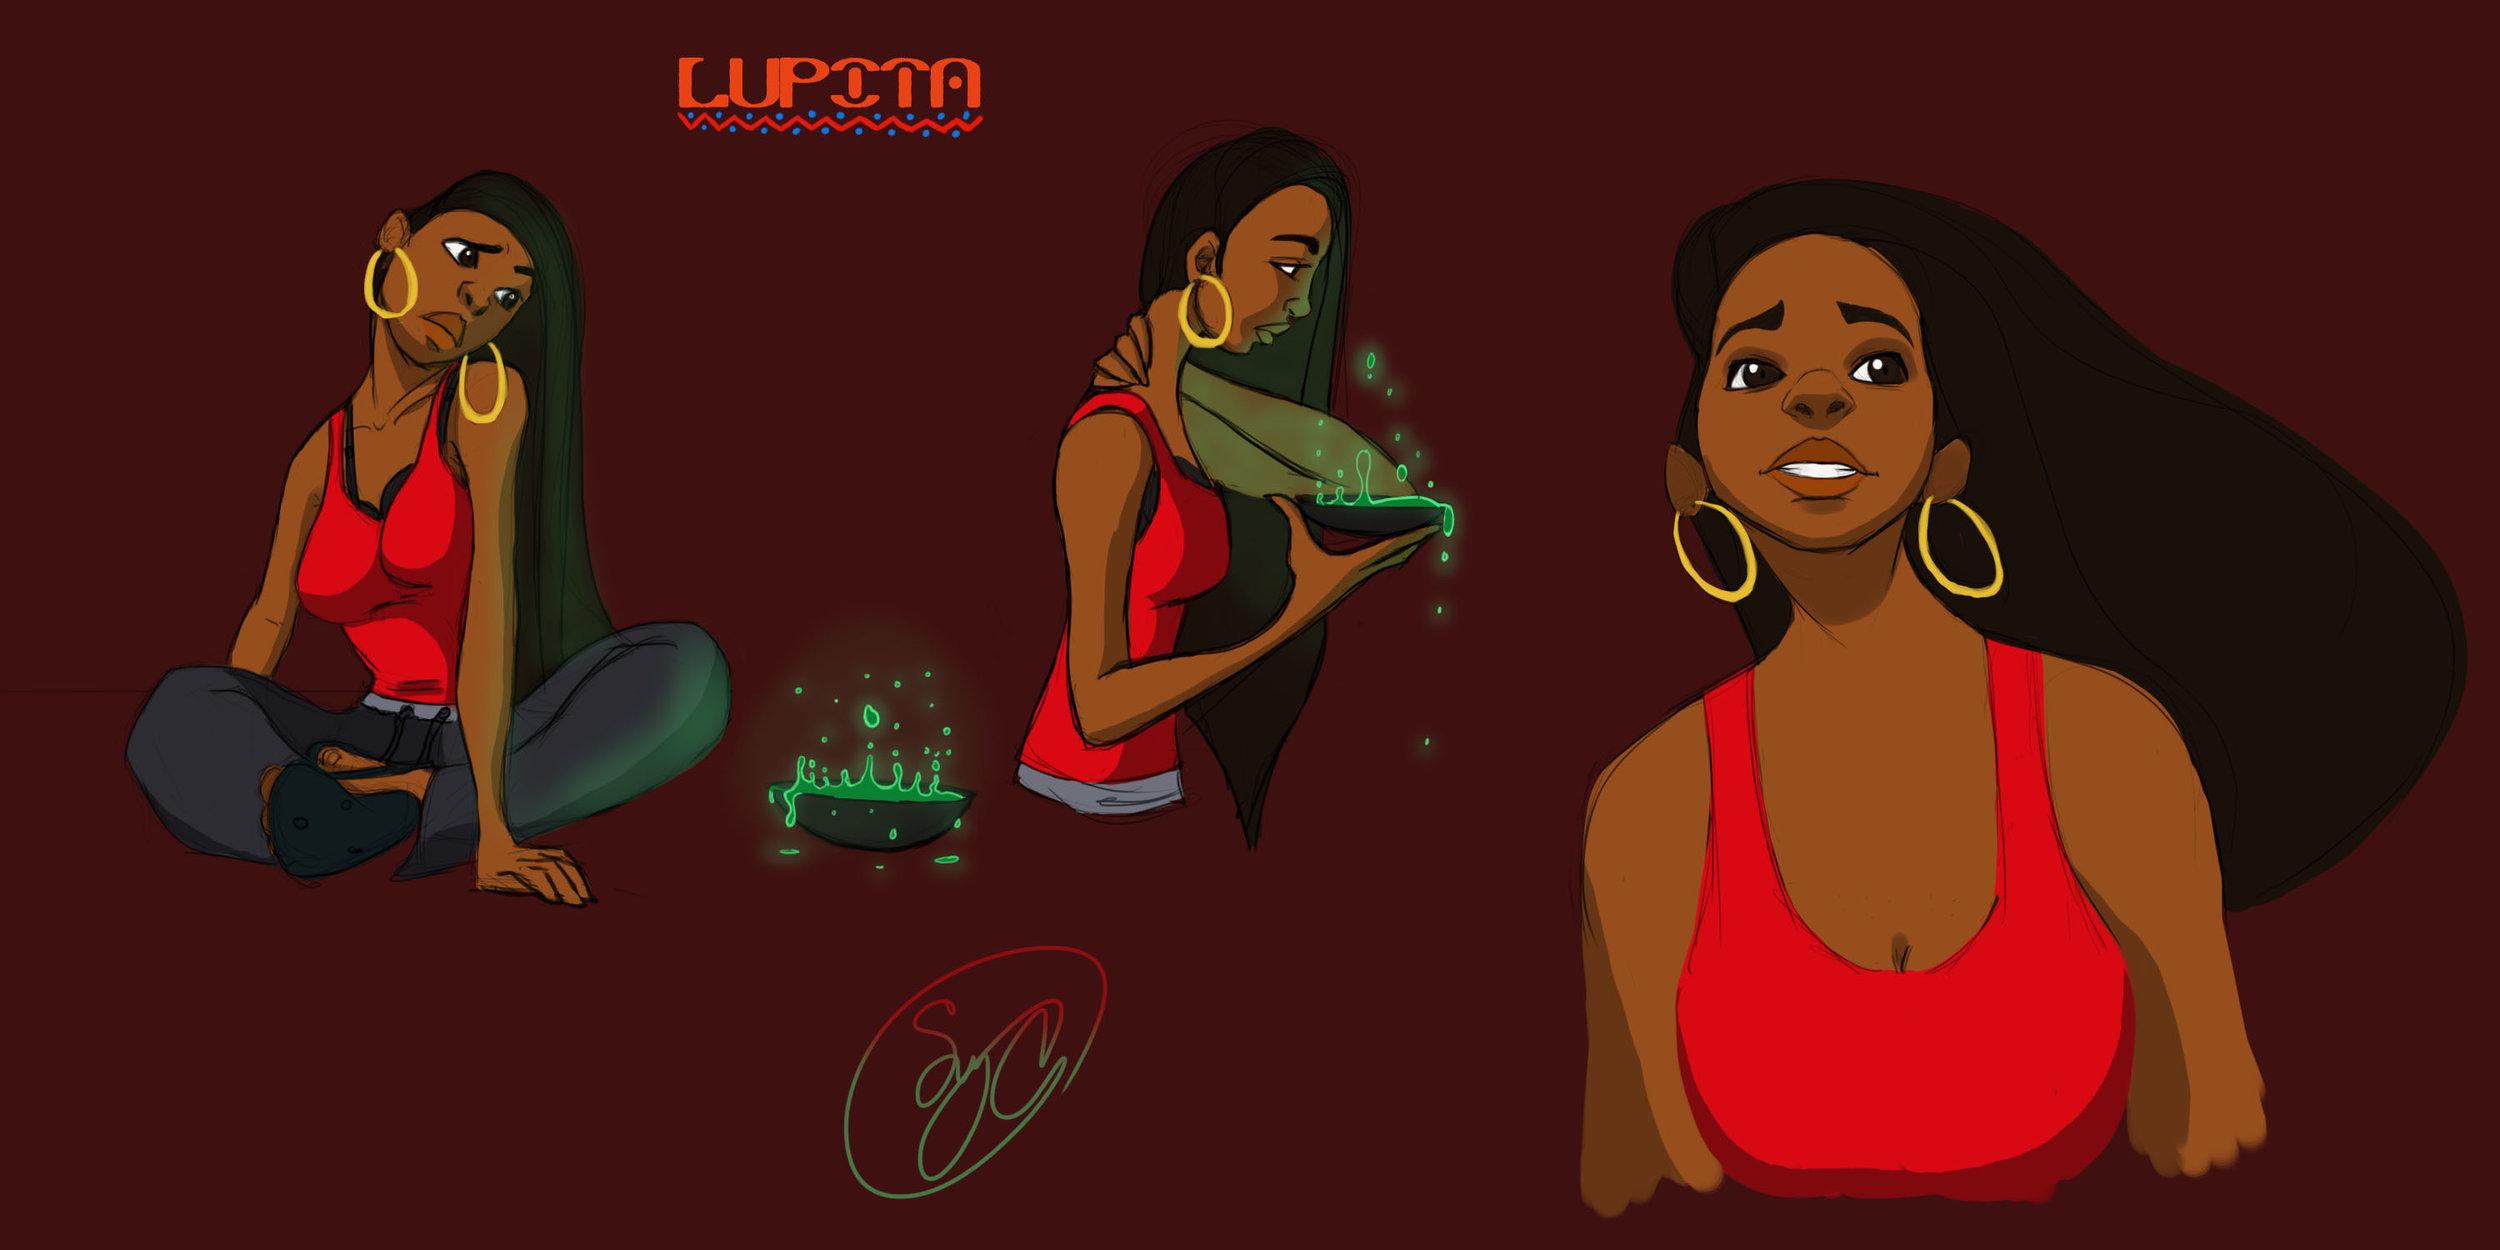 Lupita.jpg